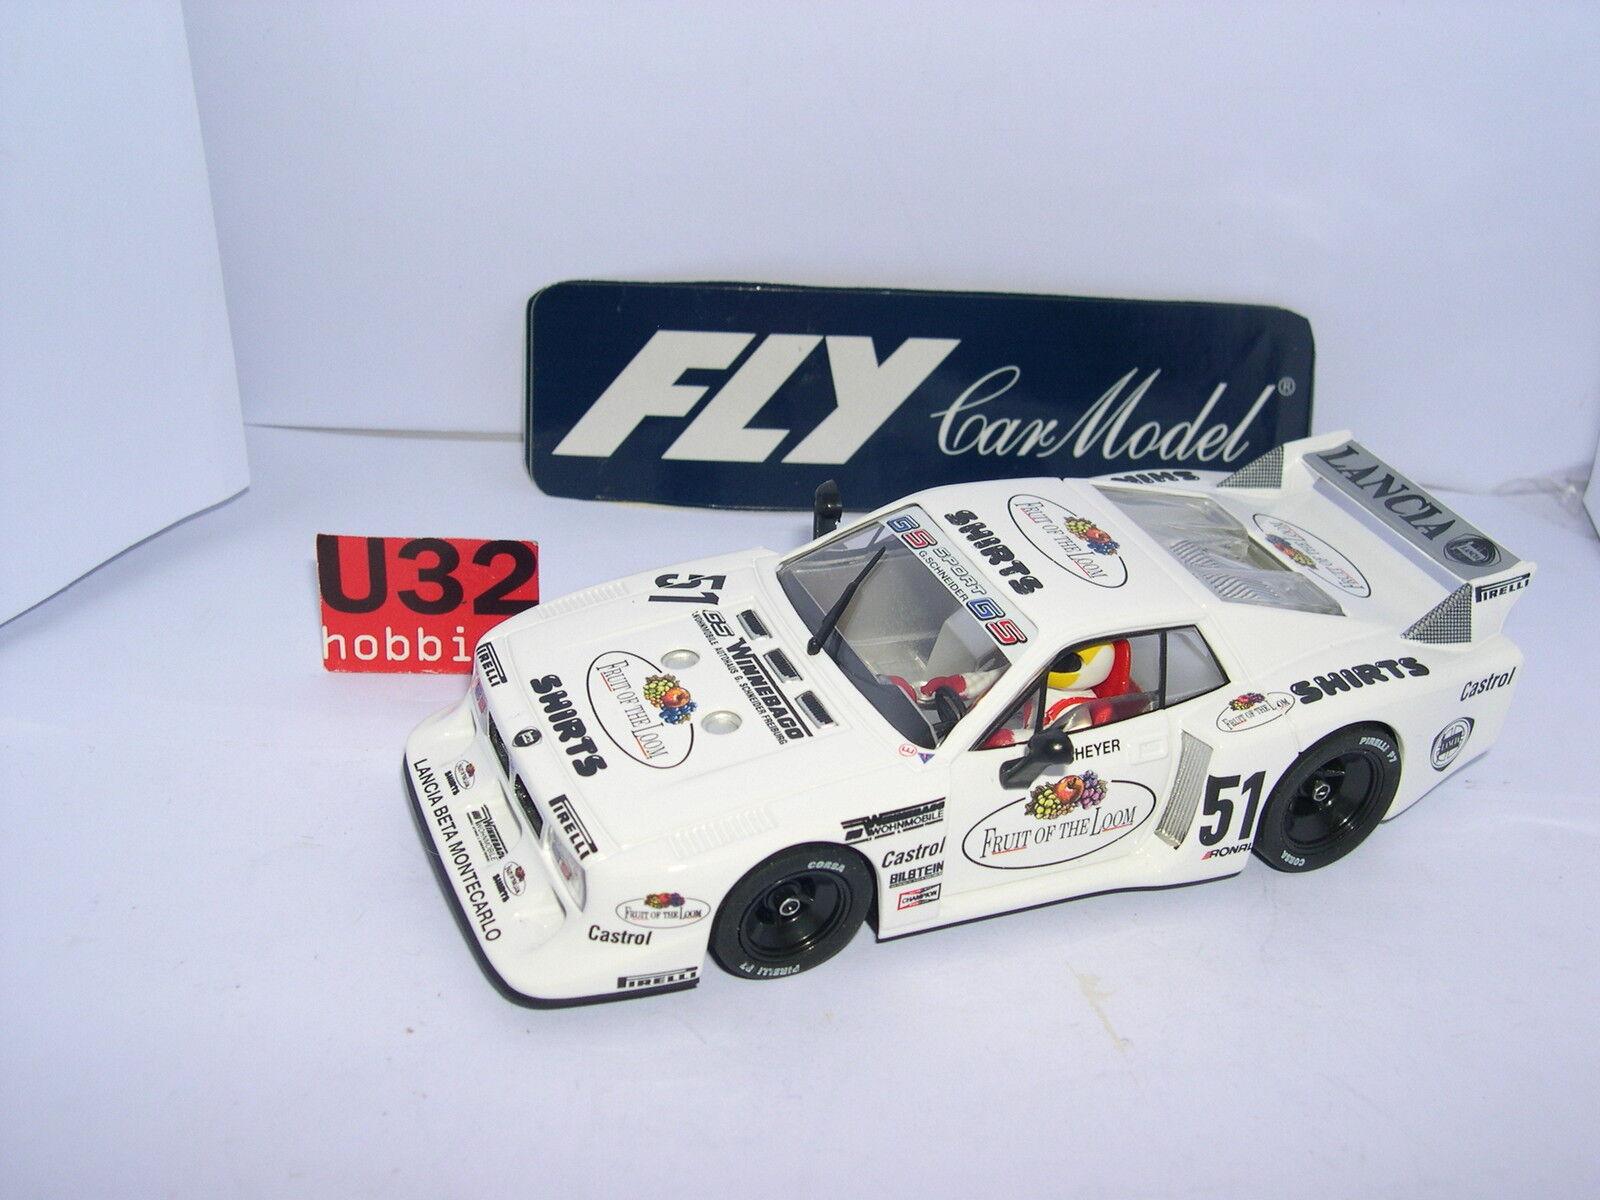 flygaga samling Crin Lancia Beta Montebillo Drm 1980 H. Heyer Mint Lted.Ed.